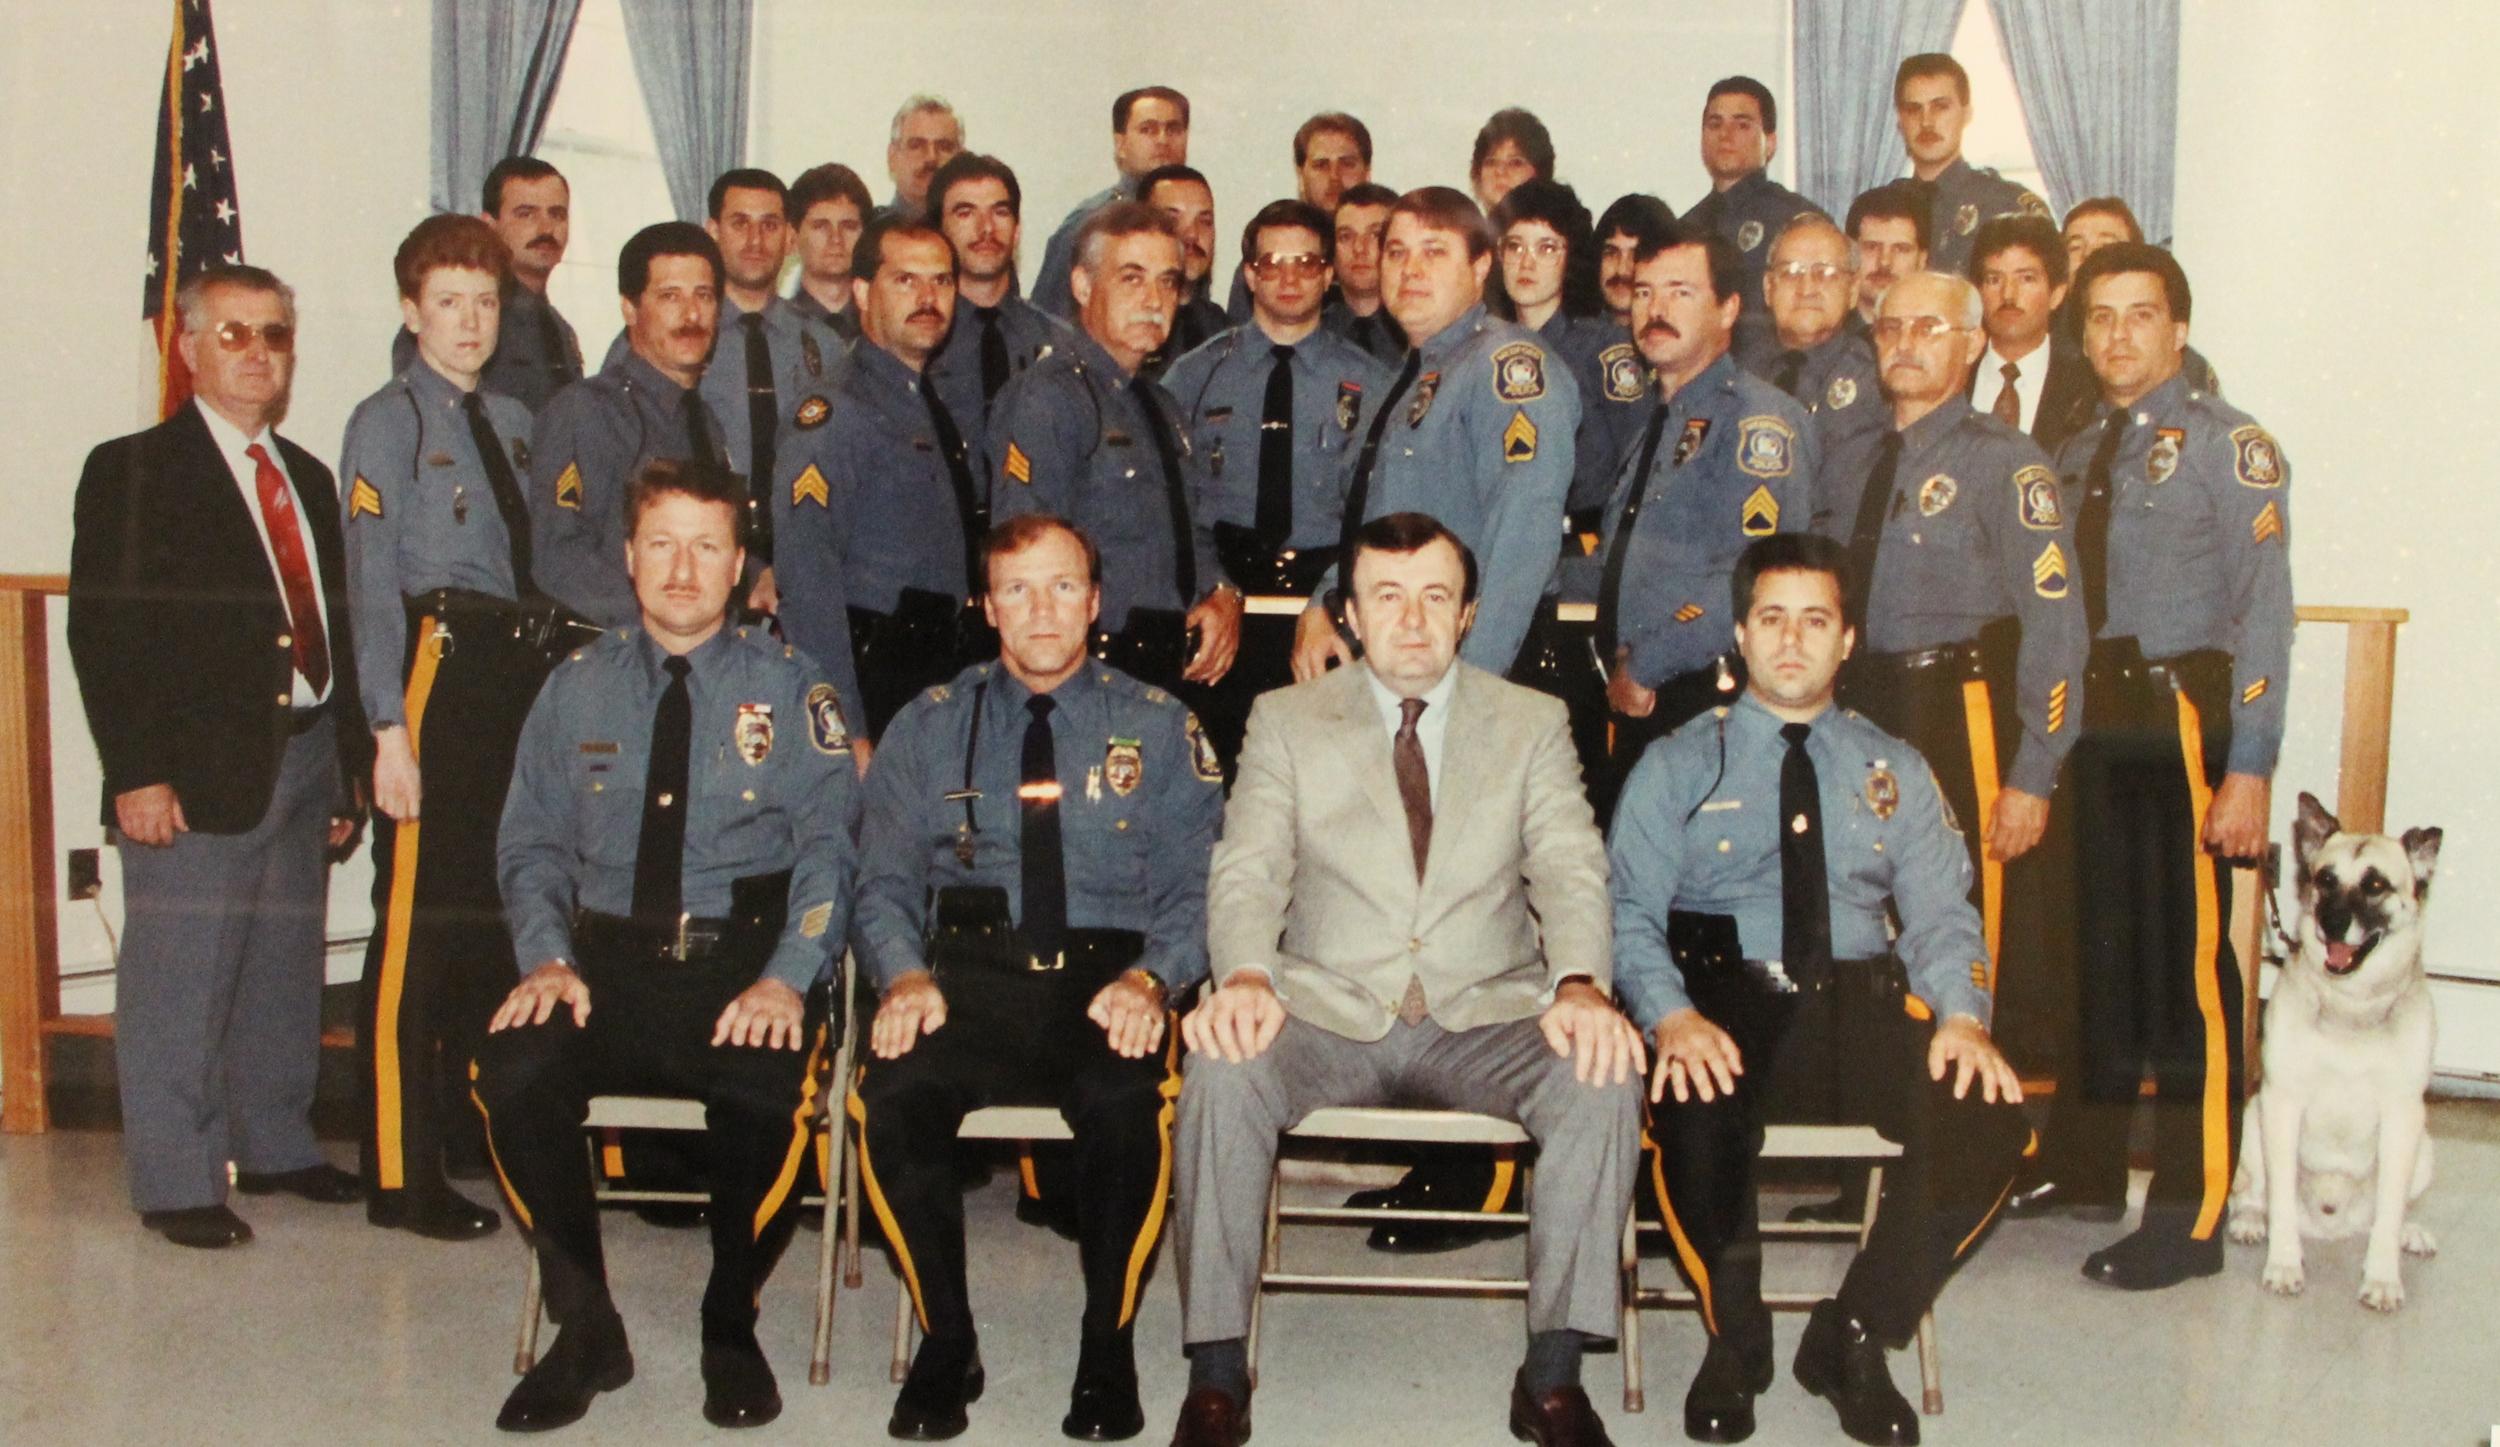 1989 Department Photo